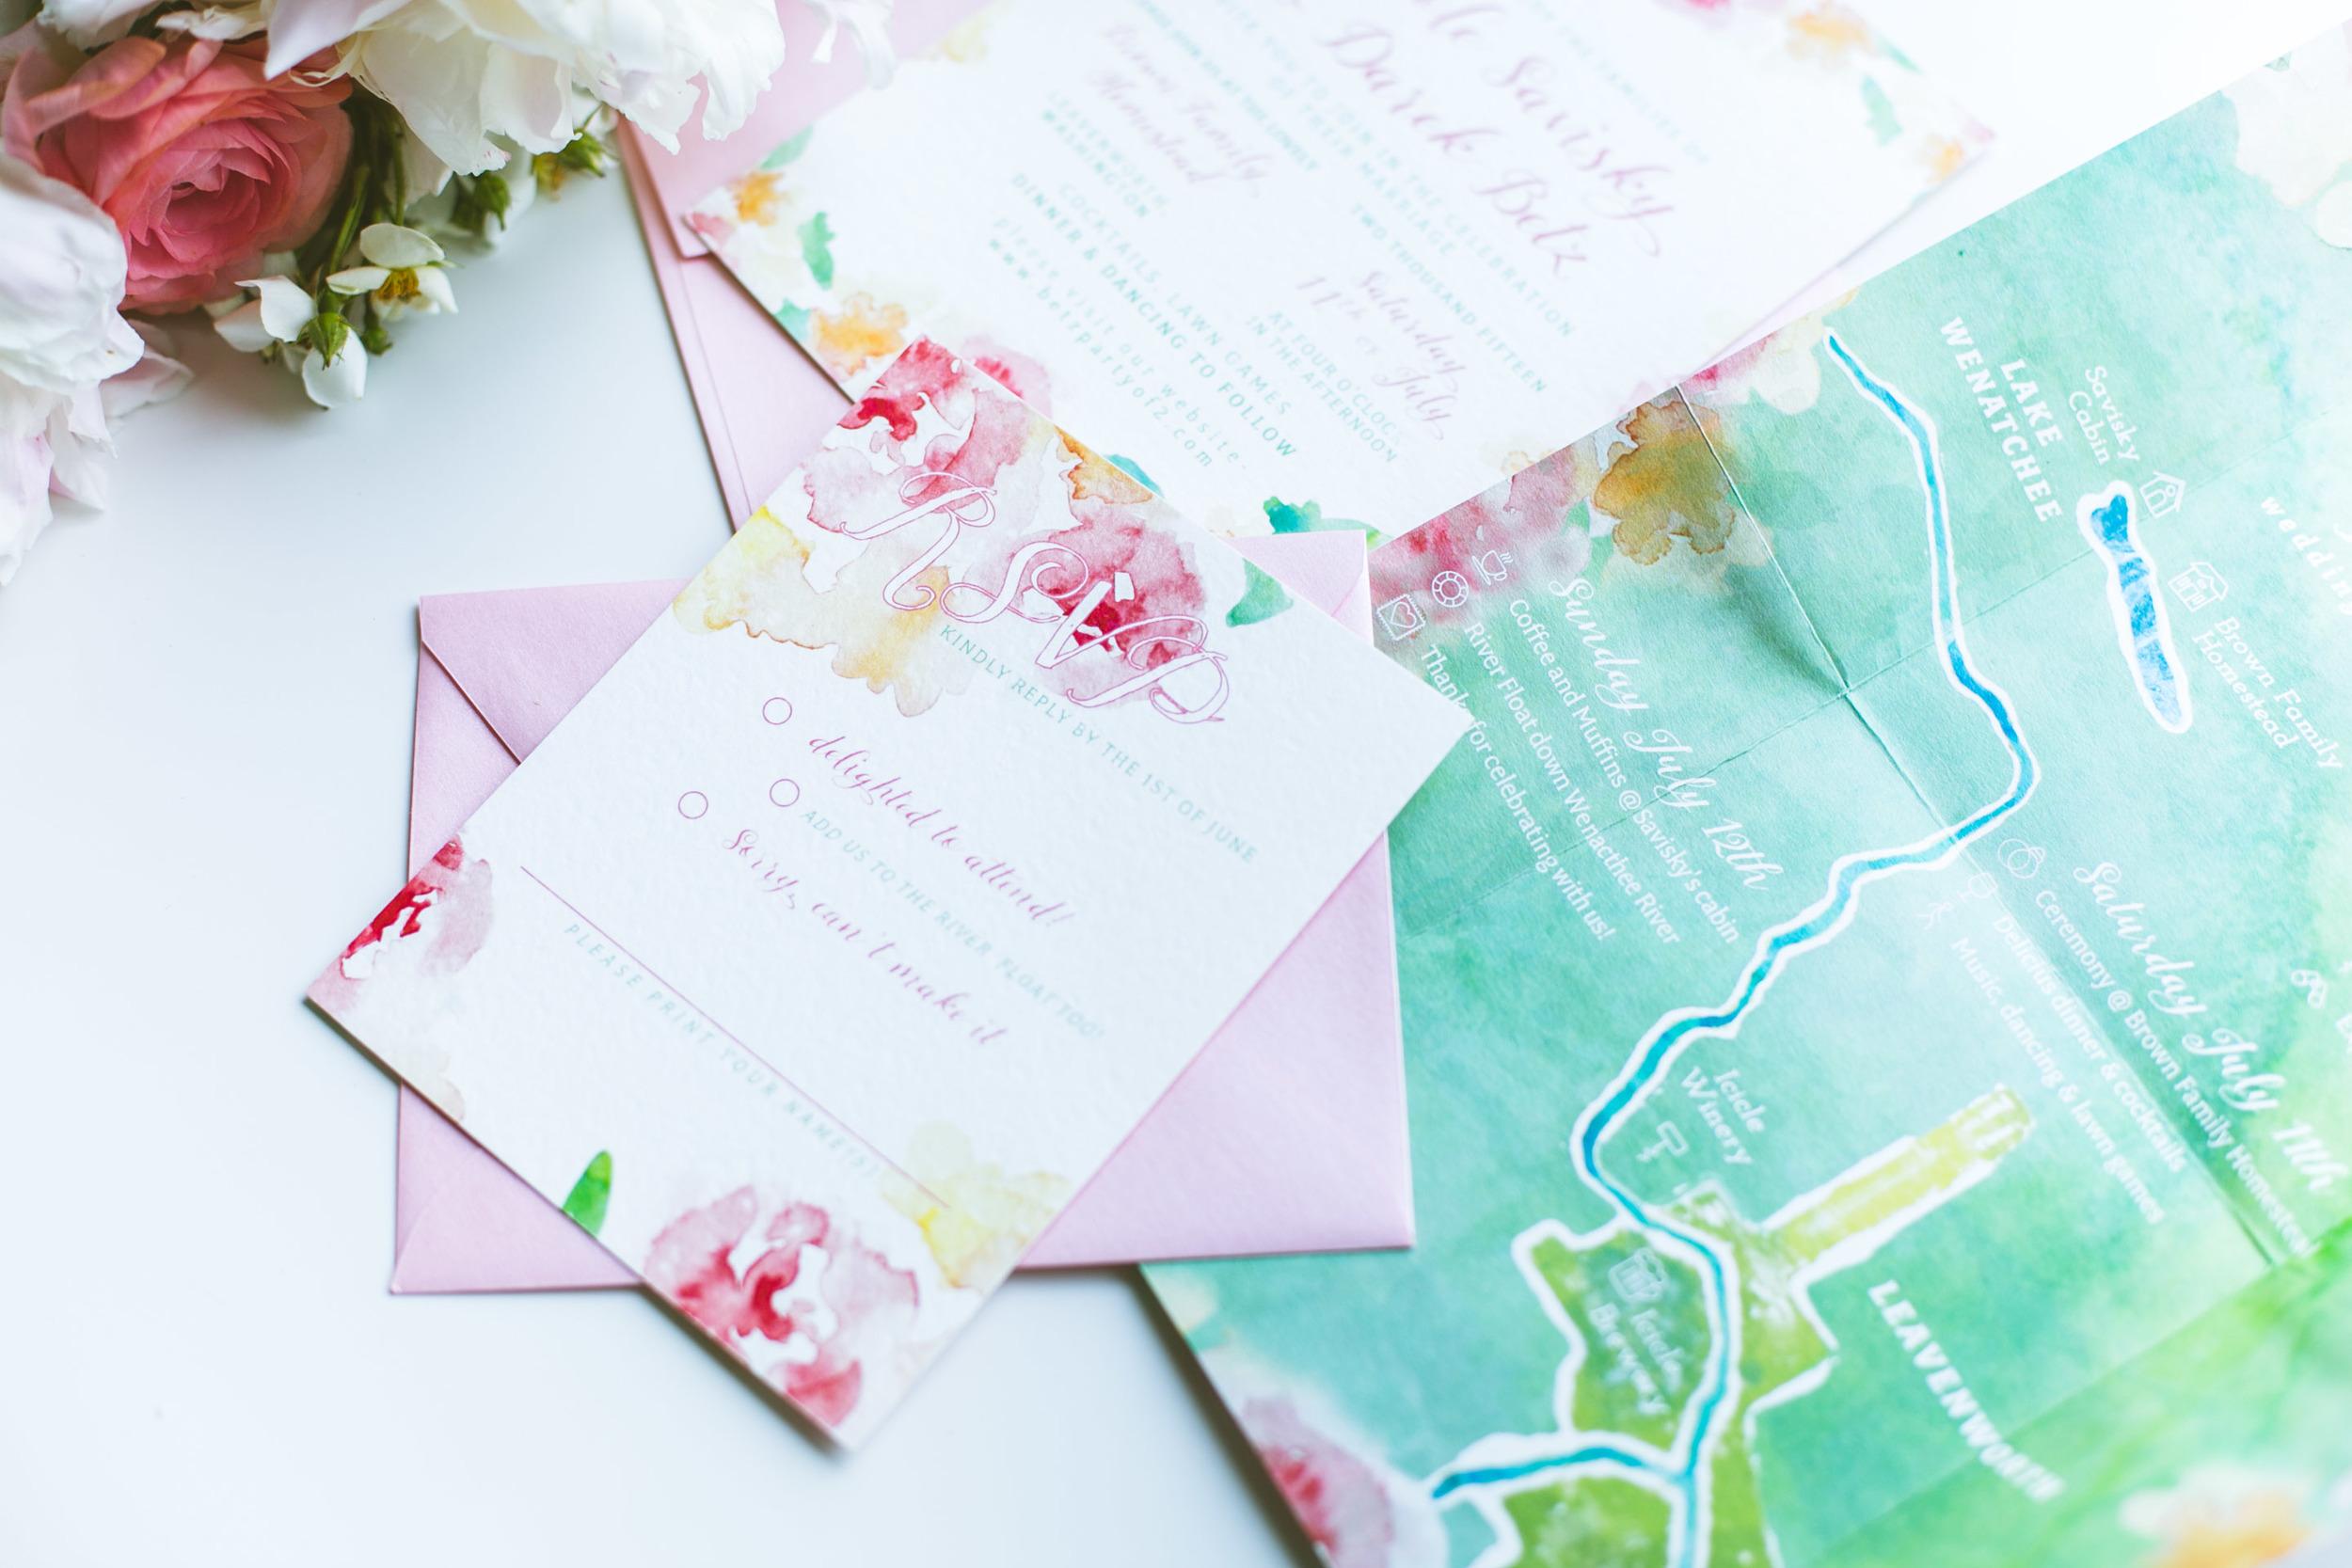 Nikki & Darek's wedding suite by Kate & Design   |  photo by  ninethirty creative